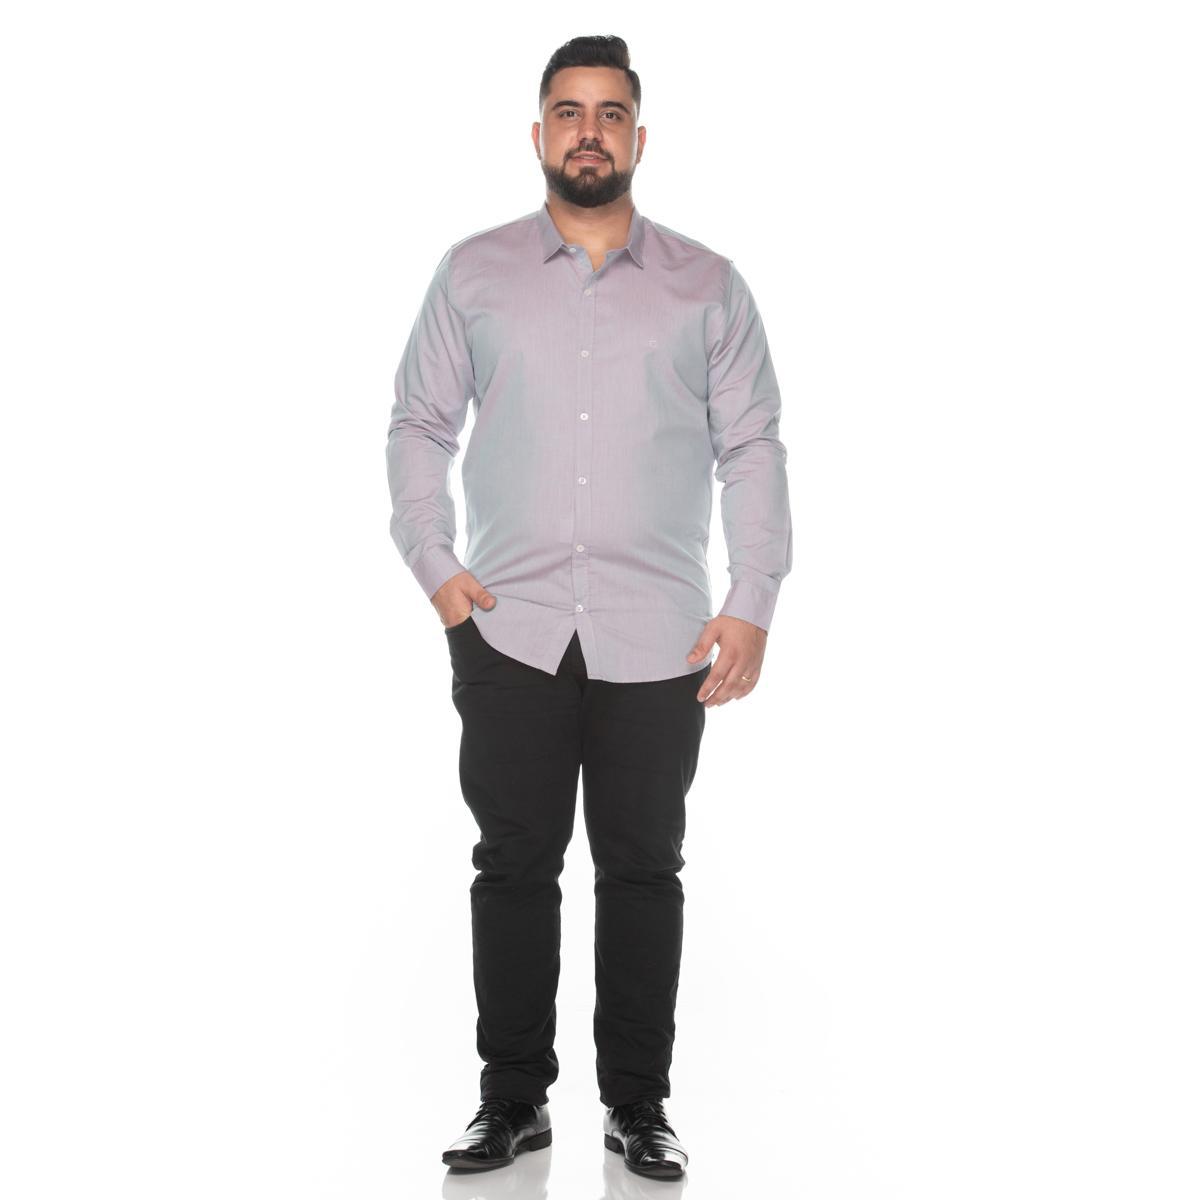 Camisa Social Teodoro Masculina Ml Plus Size Algodão Casual Branco G3